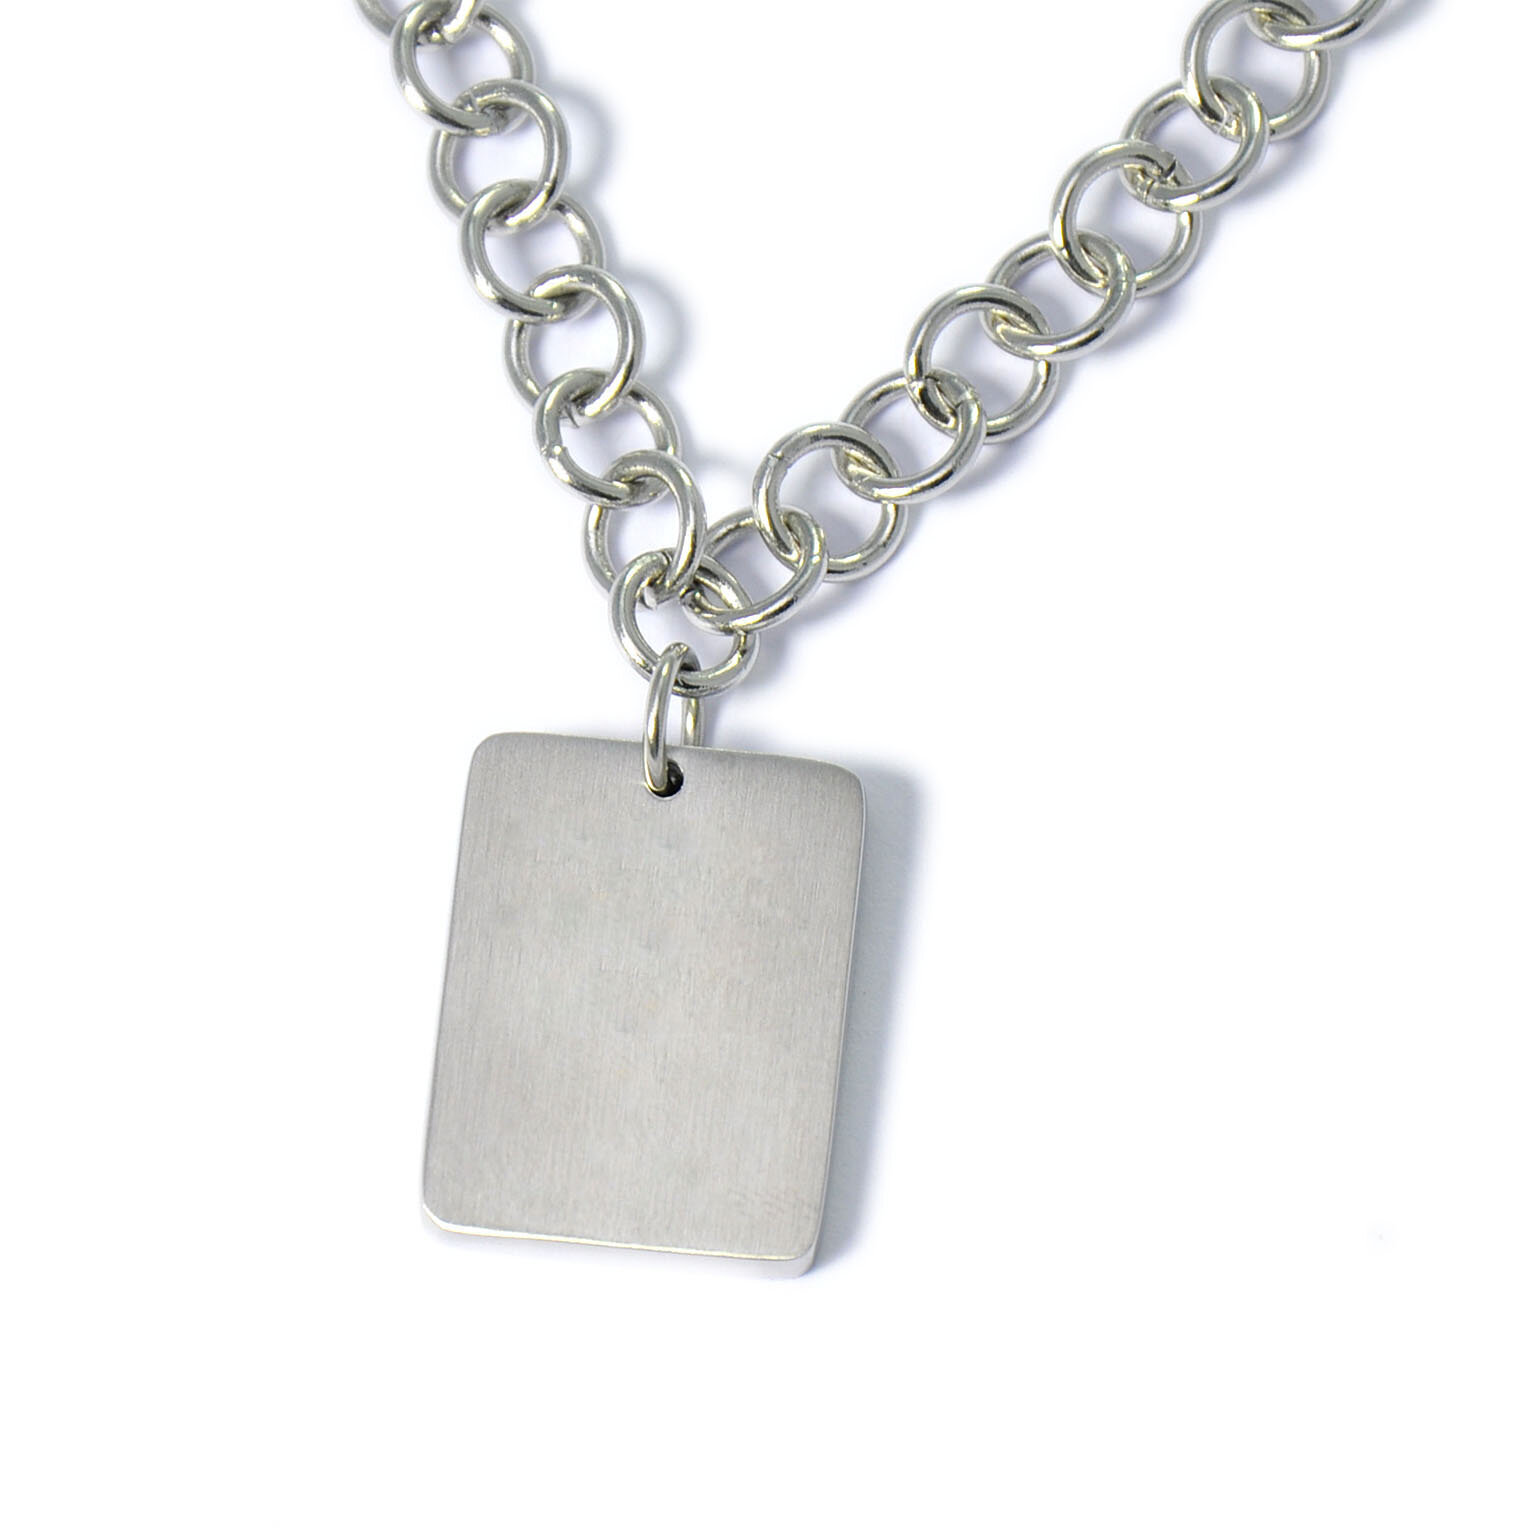 Square Charm Bracelet: U Name It Jewelry Square Link Bracelet